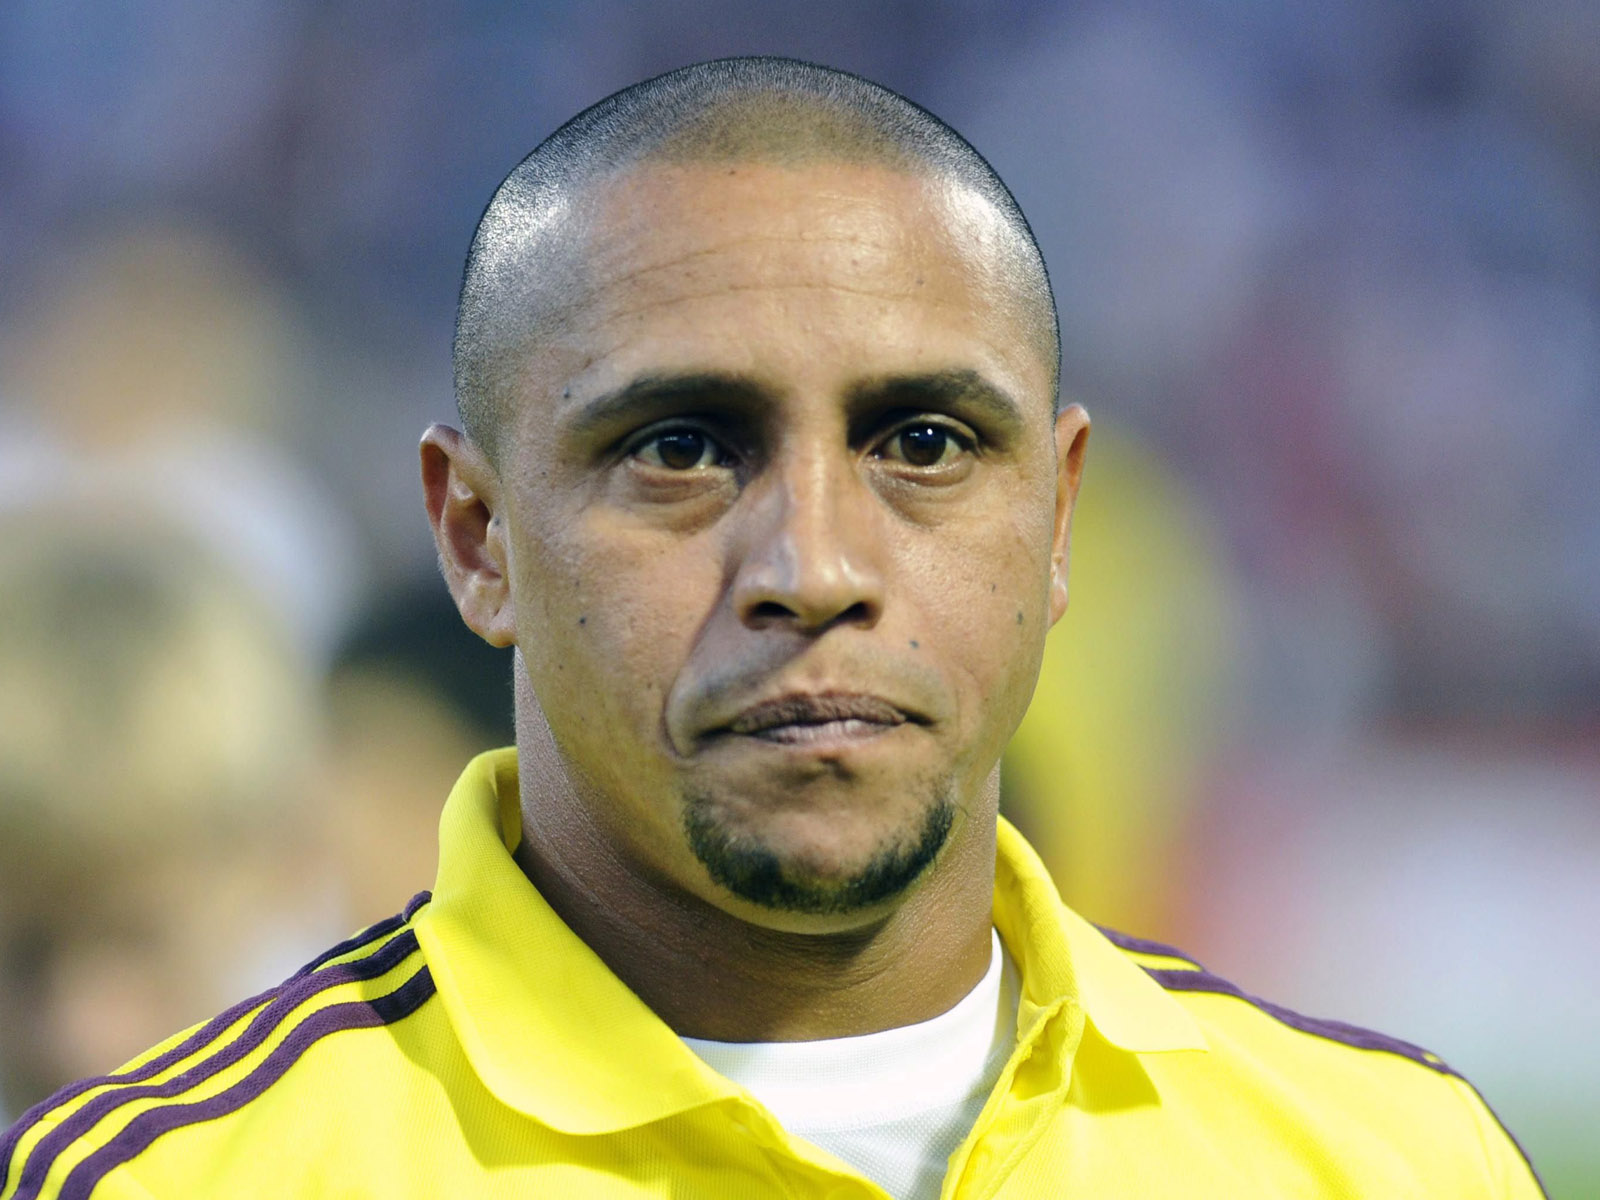 Doping: Brasilianische Topsportler unter Verdacht